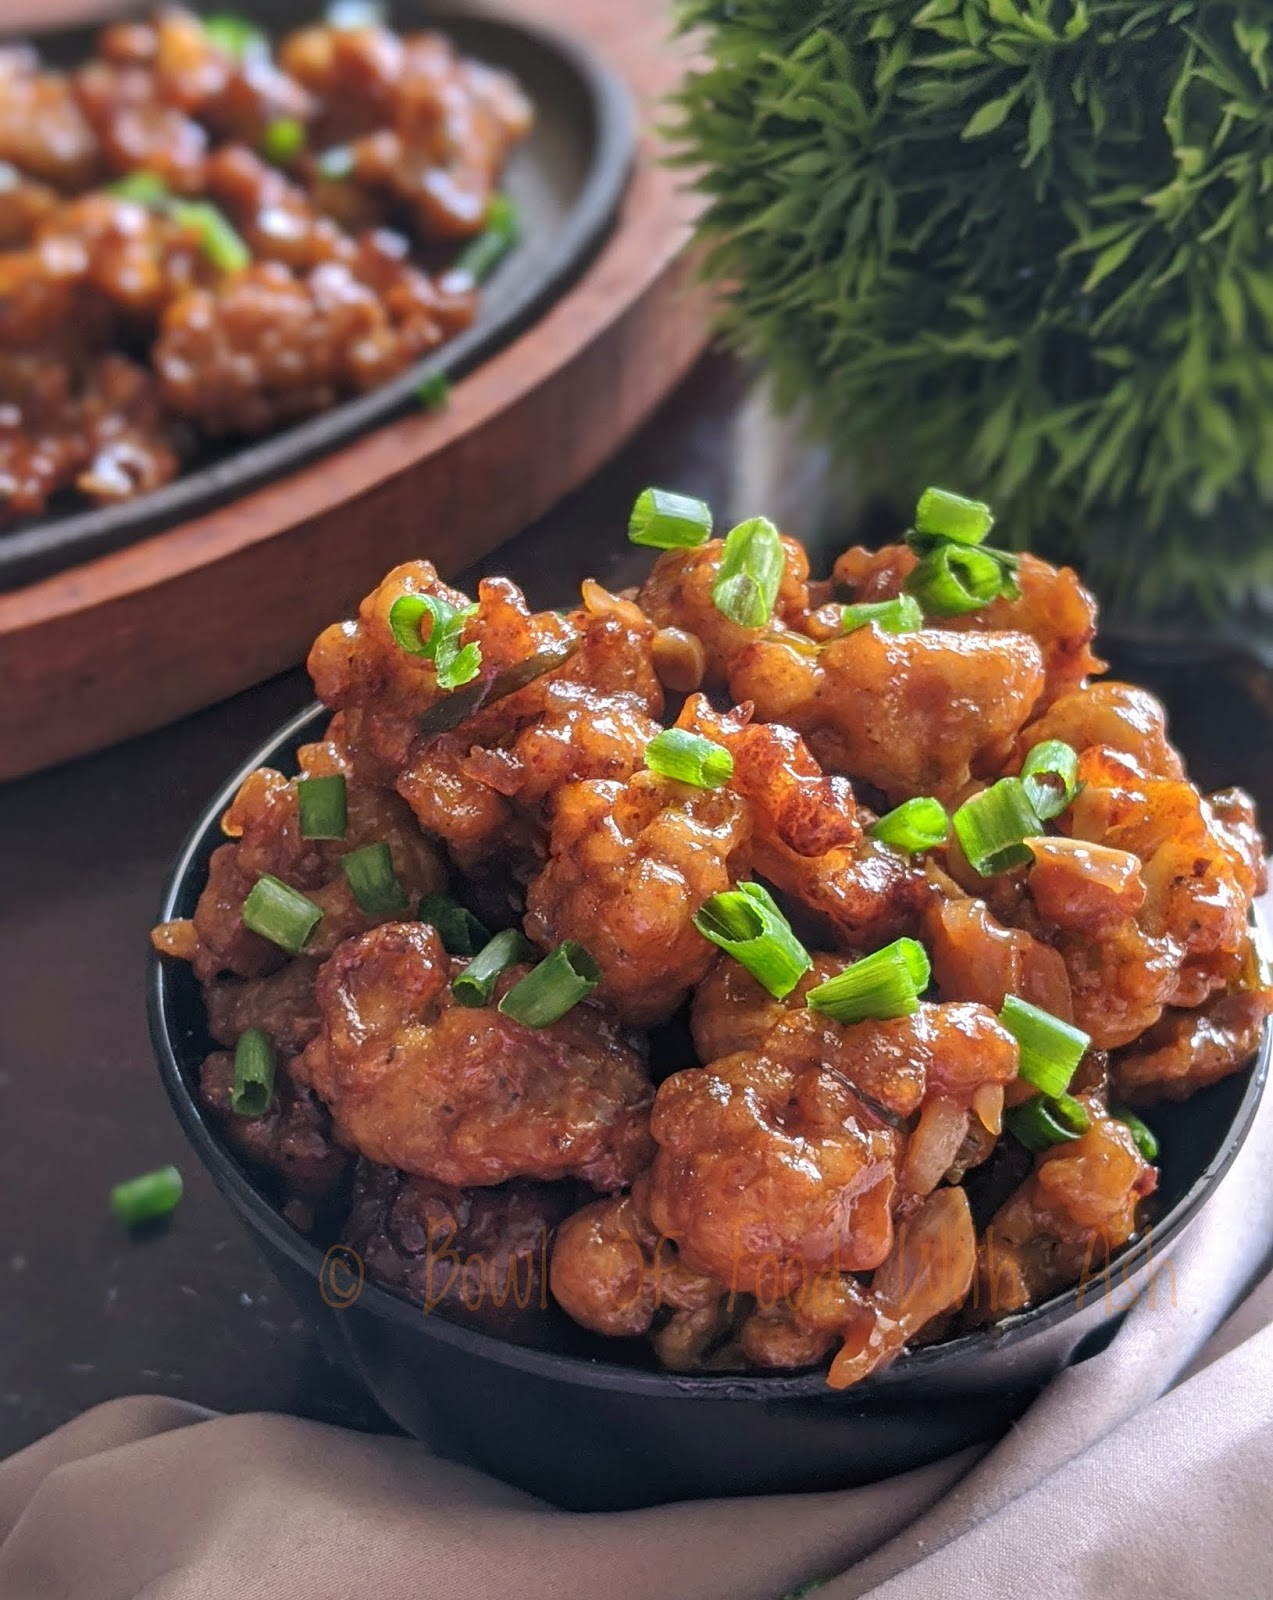 Gobi Manchurian recipe   How to make easy and crispy restaurant style Cauliflower Manchurian